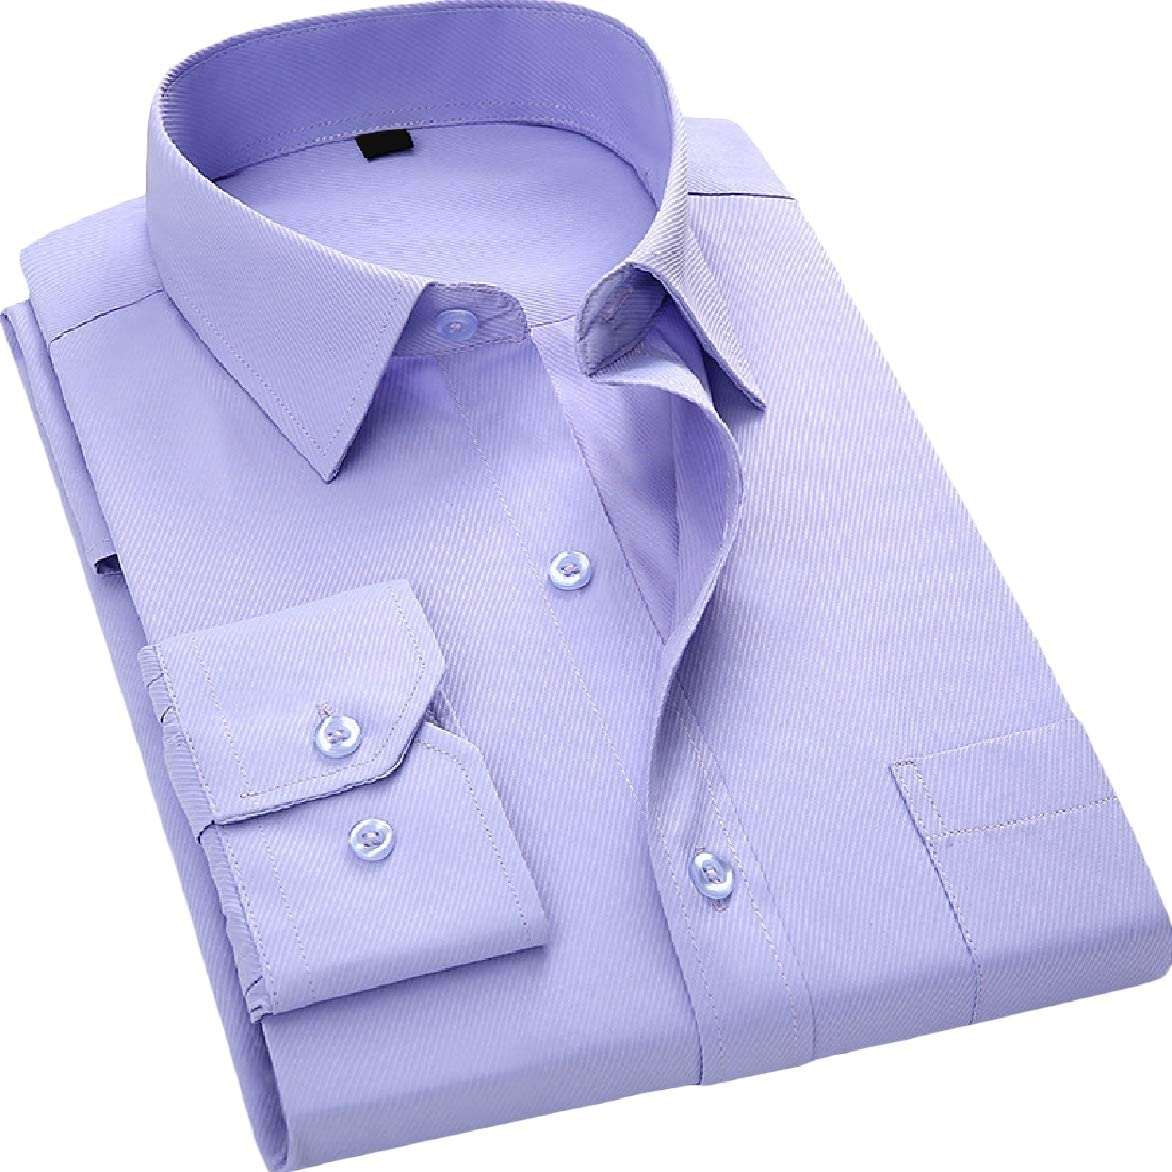 Abetteric Mens Long-Sleeve Pockets Fit Oversized Lapel Button Top Shirt